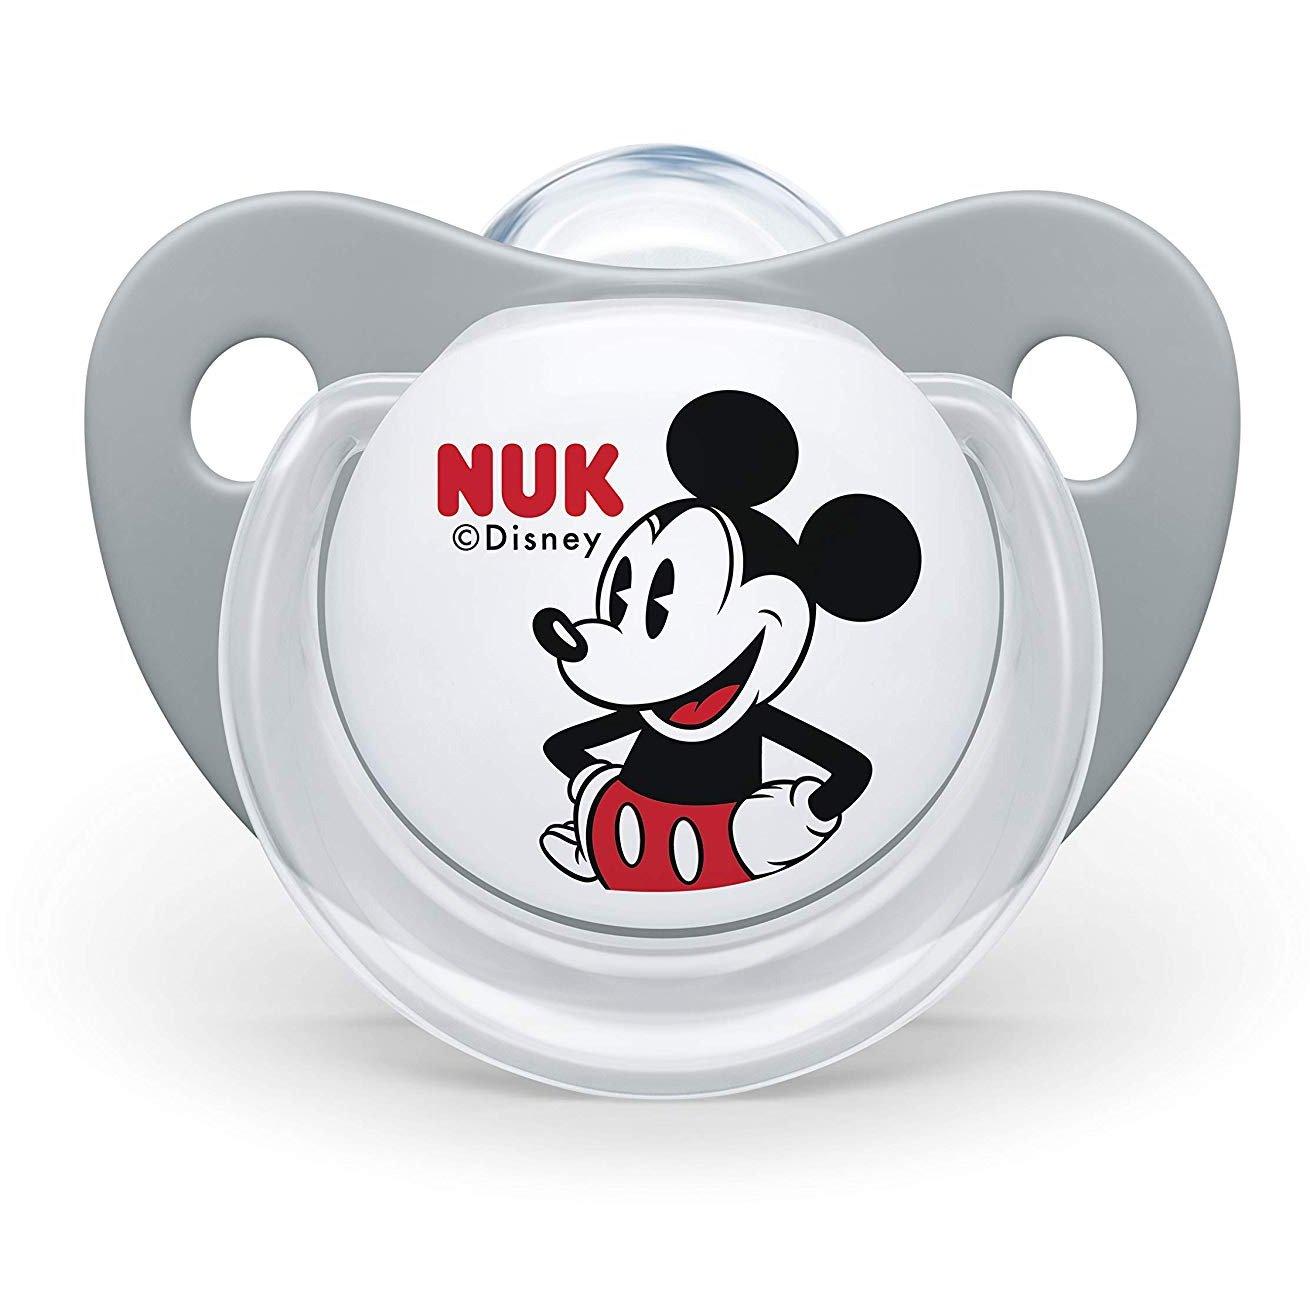 Nuk Trendline Disney Mickey Mouse Πιπίλα Σιλικόνης με Κρίκο 1 Τεμάχιο – 0-6 Μηνών Γκρι